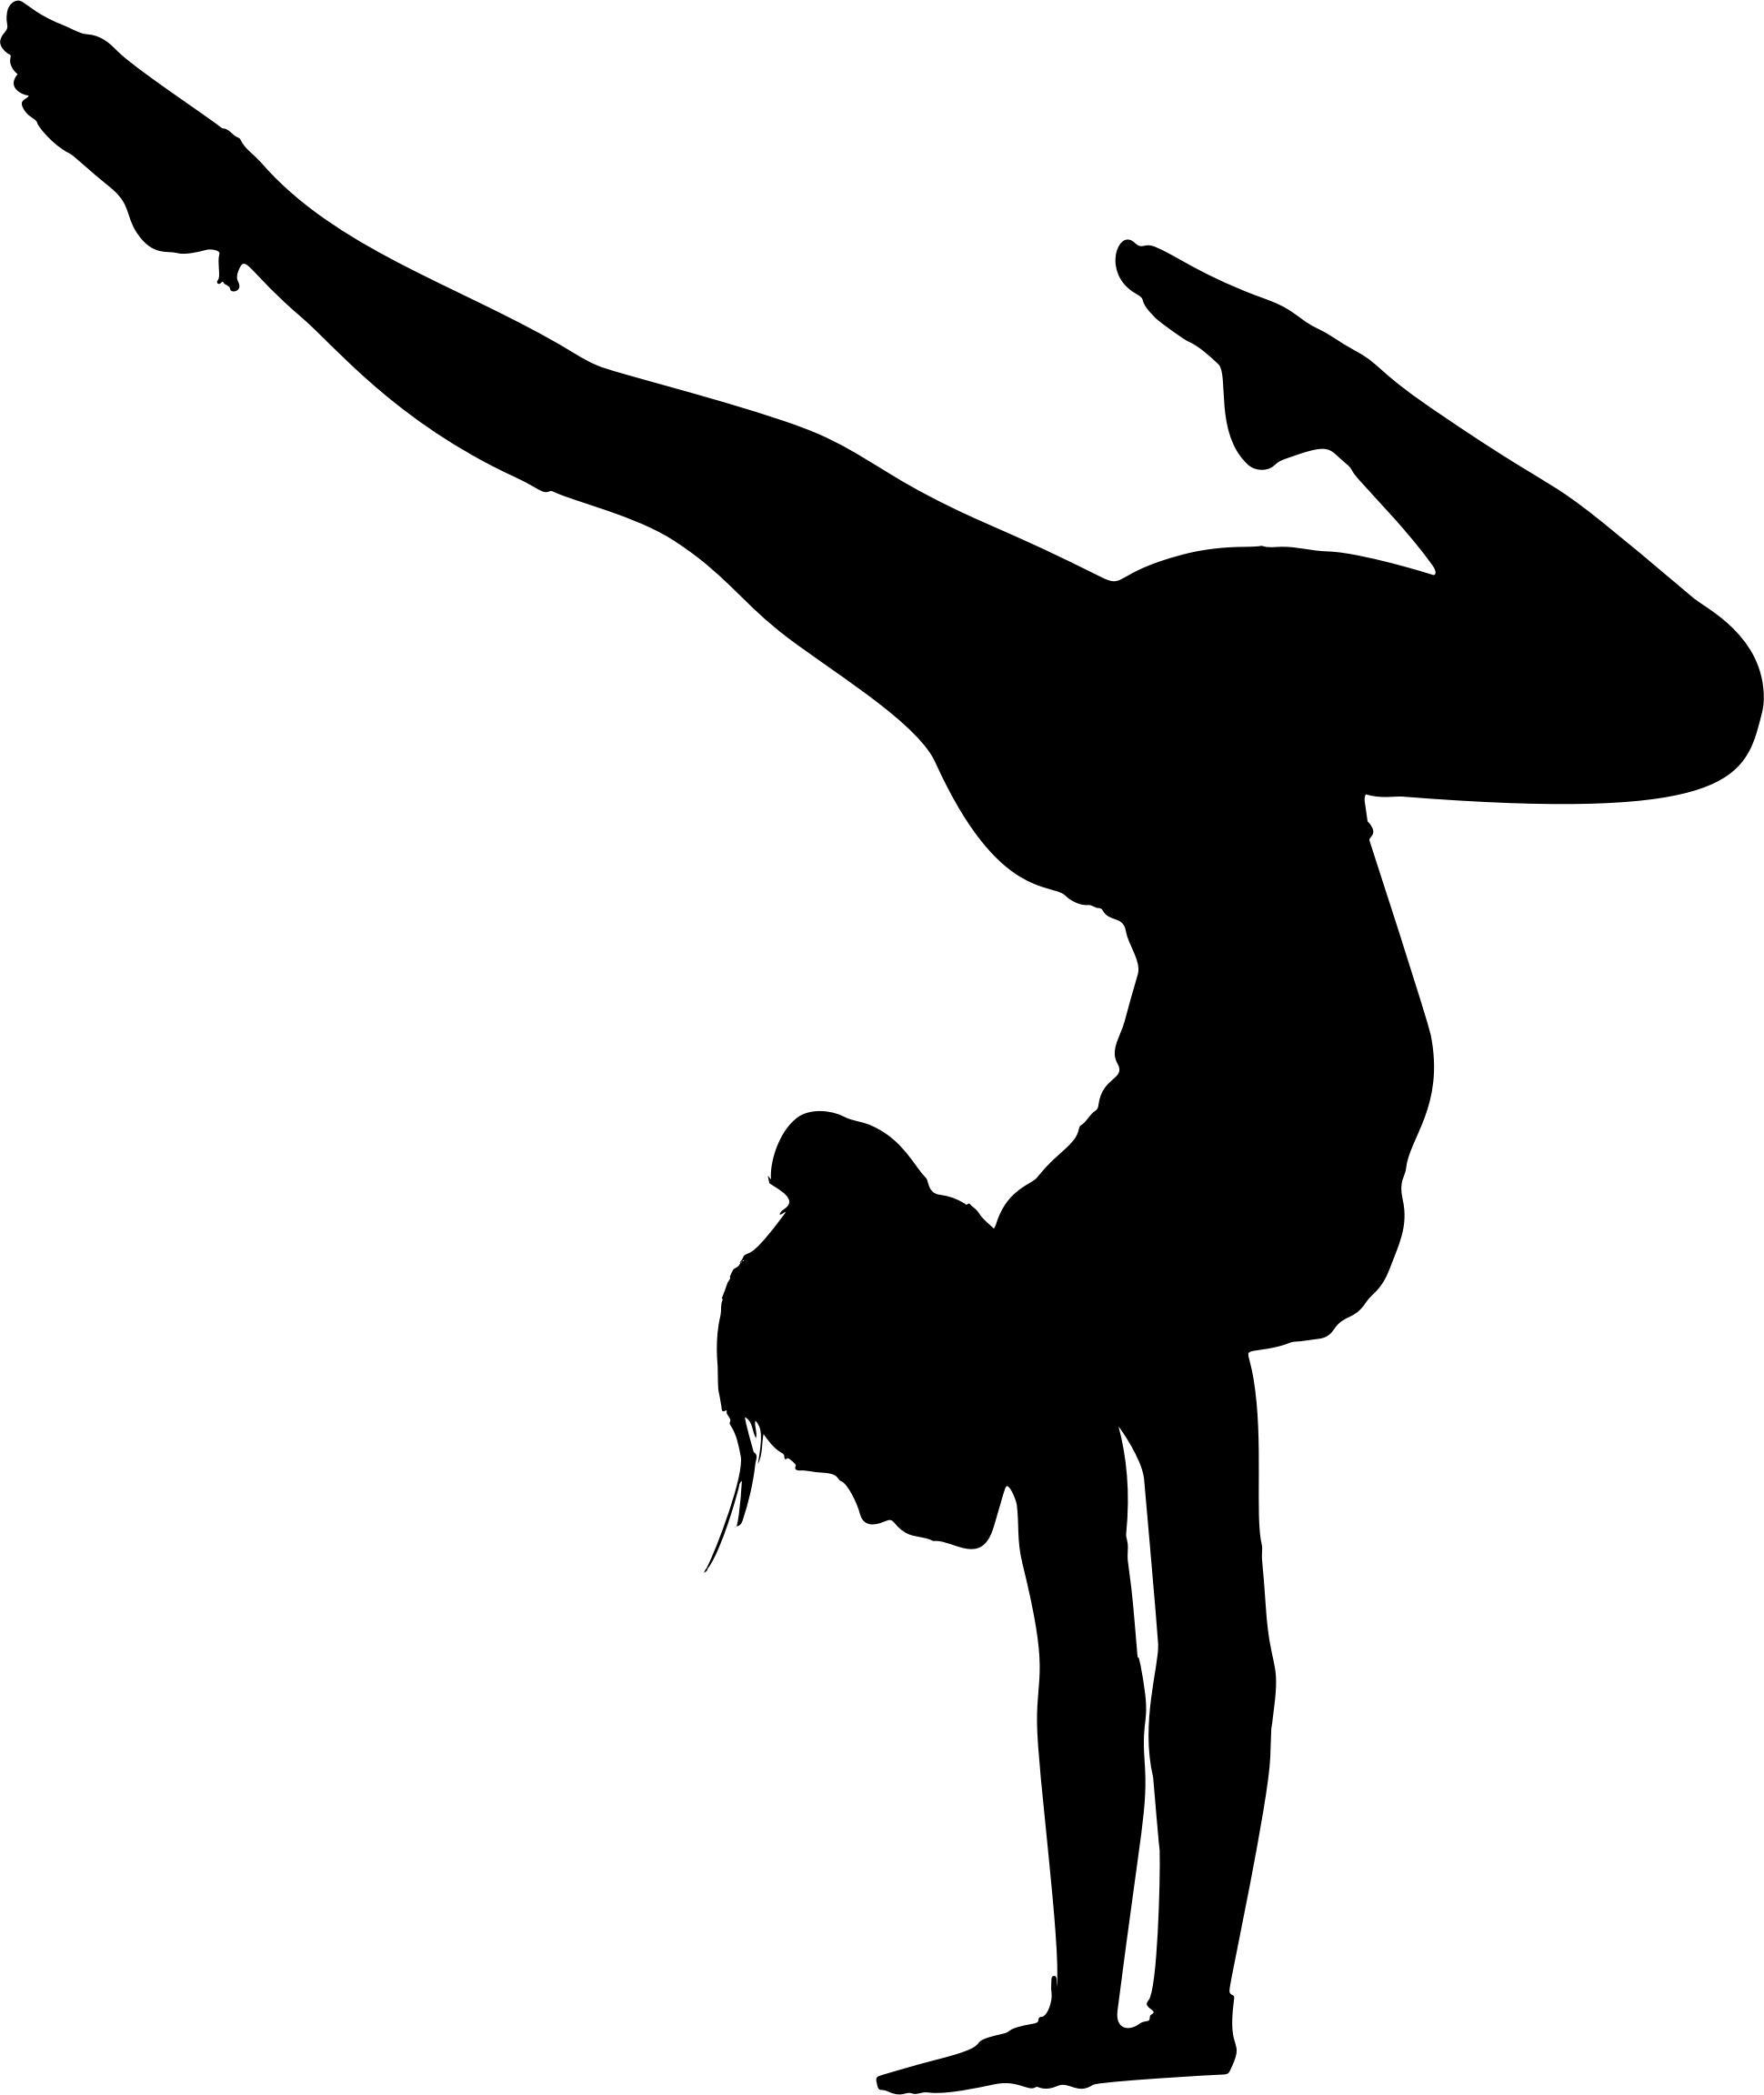 1940x2304 Female Yoga Pose Silhouette 22 Icons Png